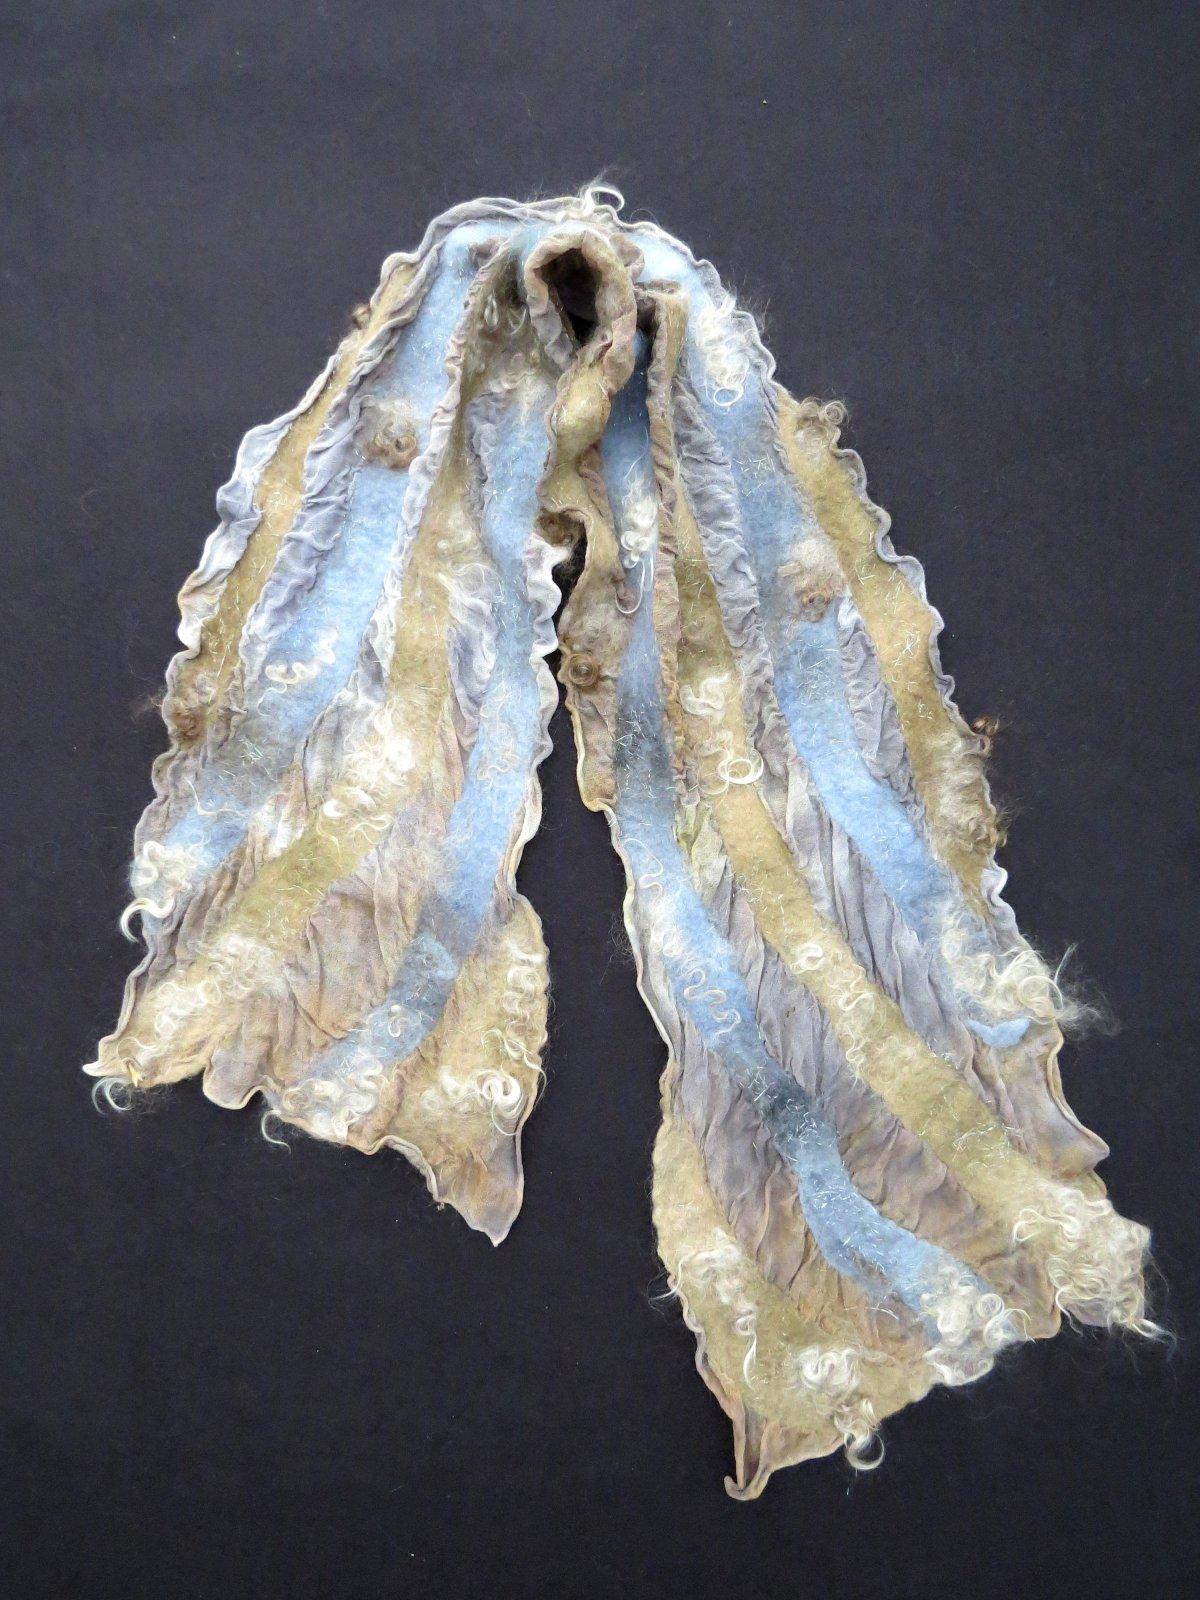 Nuno-felted Scarf - Gray/beige